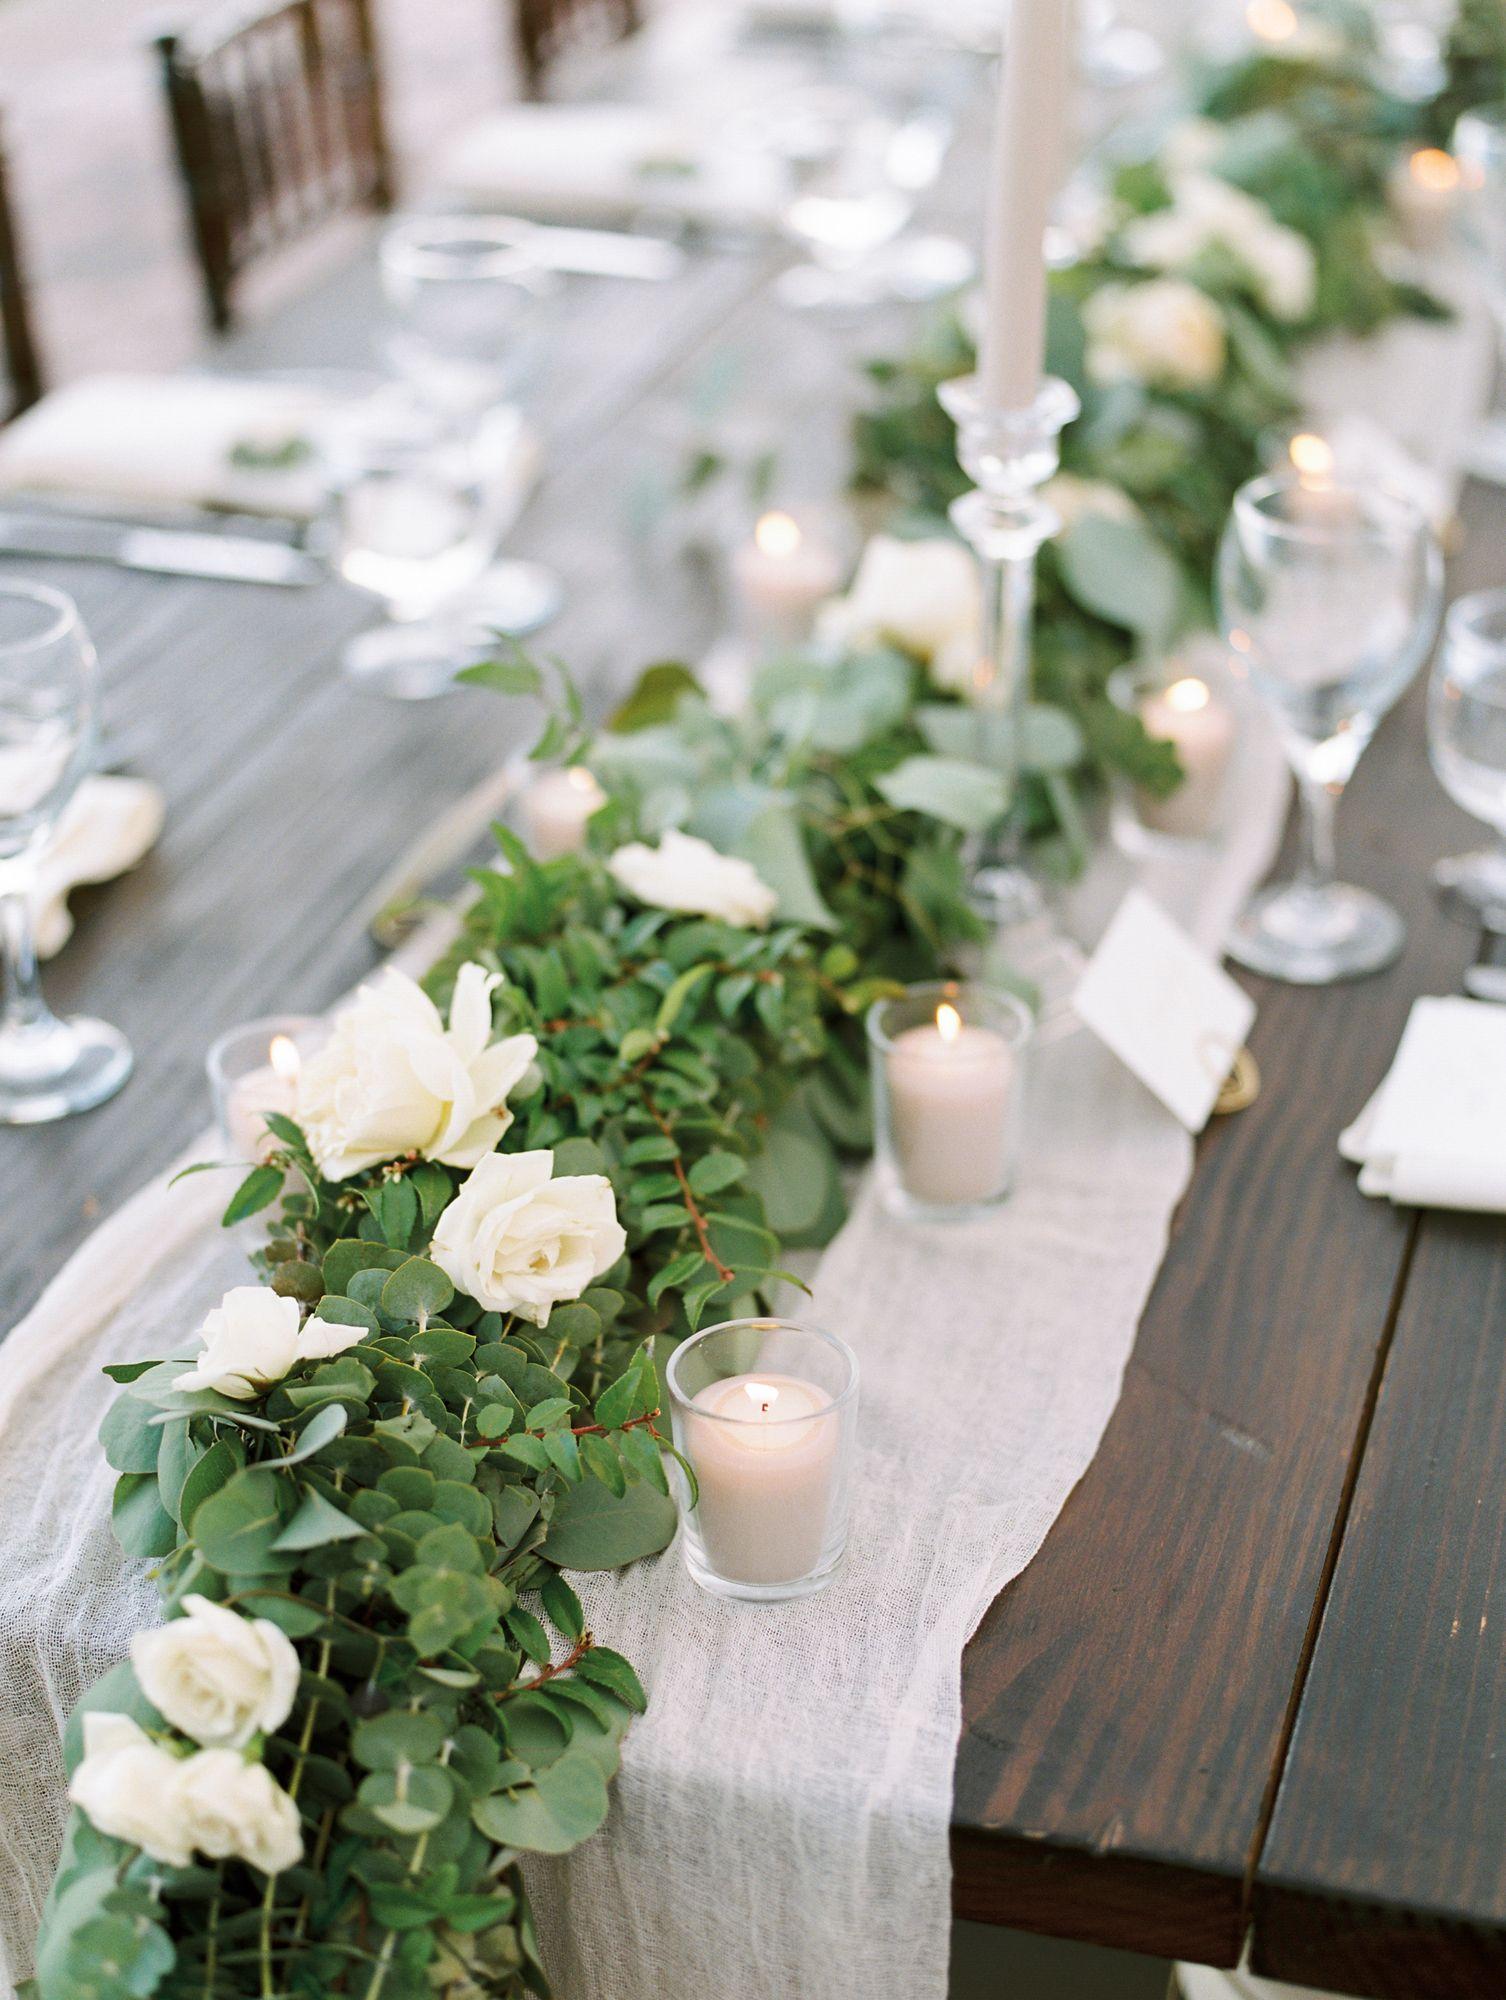 Casual Elegance at Brittland Manor - A Wedding Bursting with Love + Emotion  | Green wedding centerpieces, Wedding centerpieces, Wedding reception  decorations